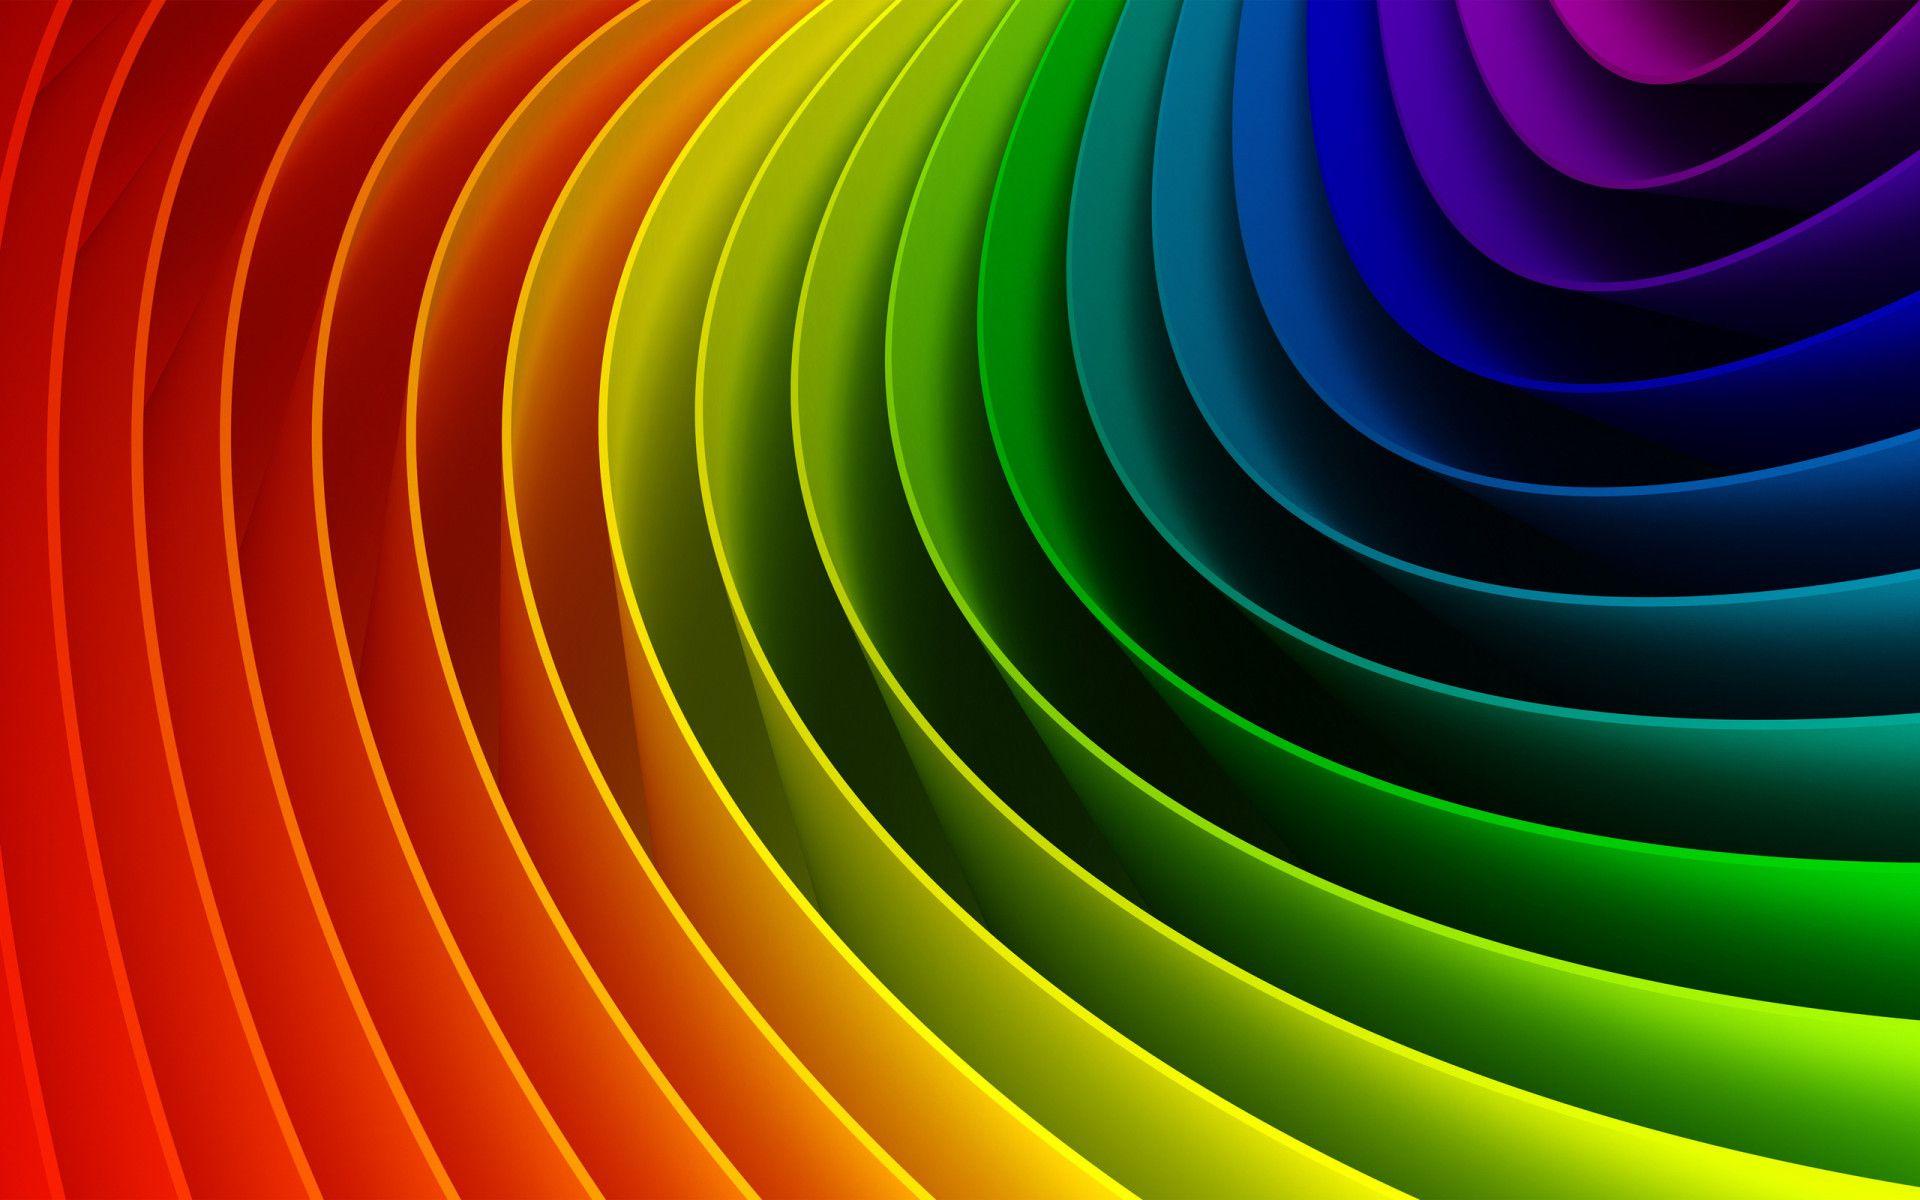 Neon Backgrounds Hd Neon Colours Desktop 1920 1200 Resolution